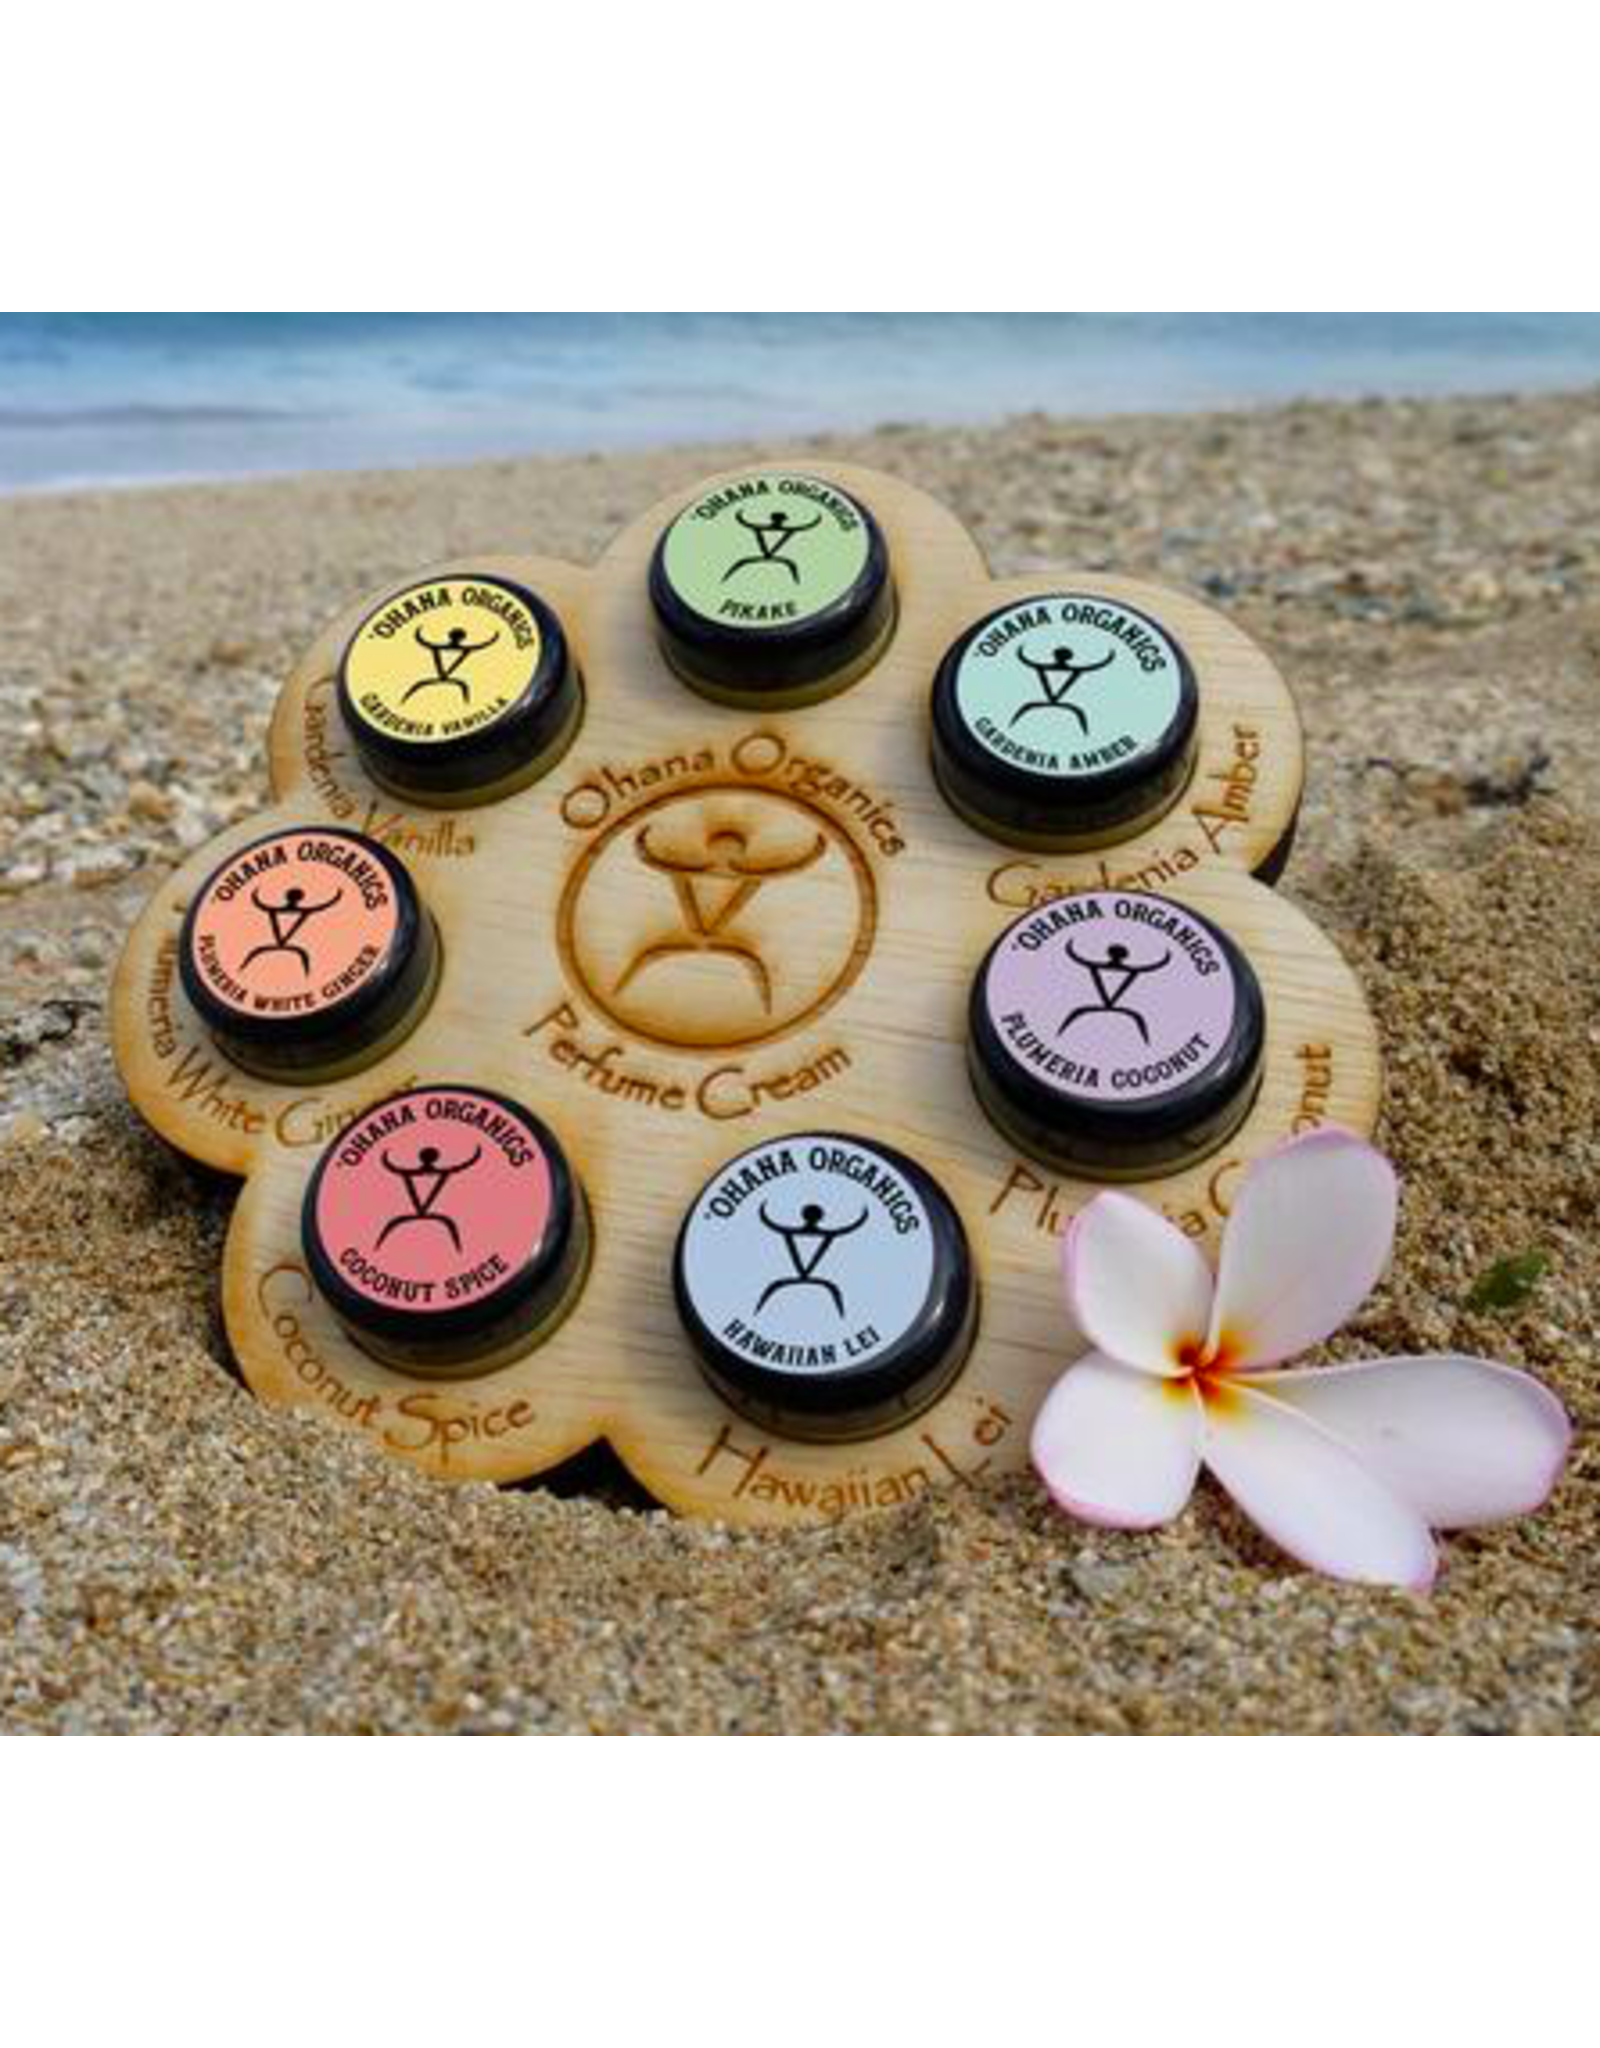 Hawaiian Lei Organic Solid Perfume Cream - Travel Size